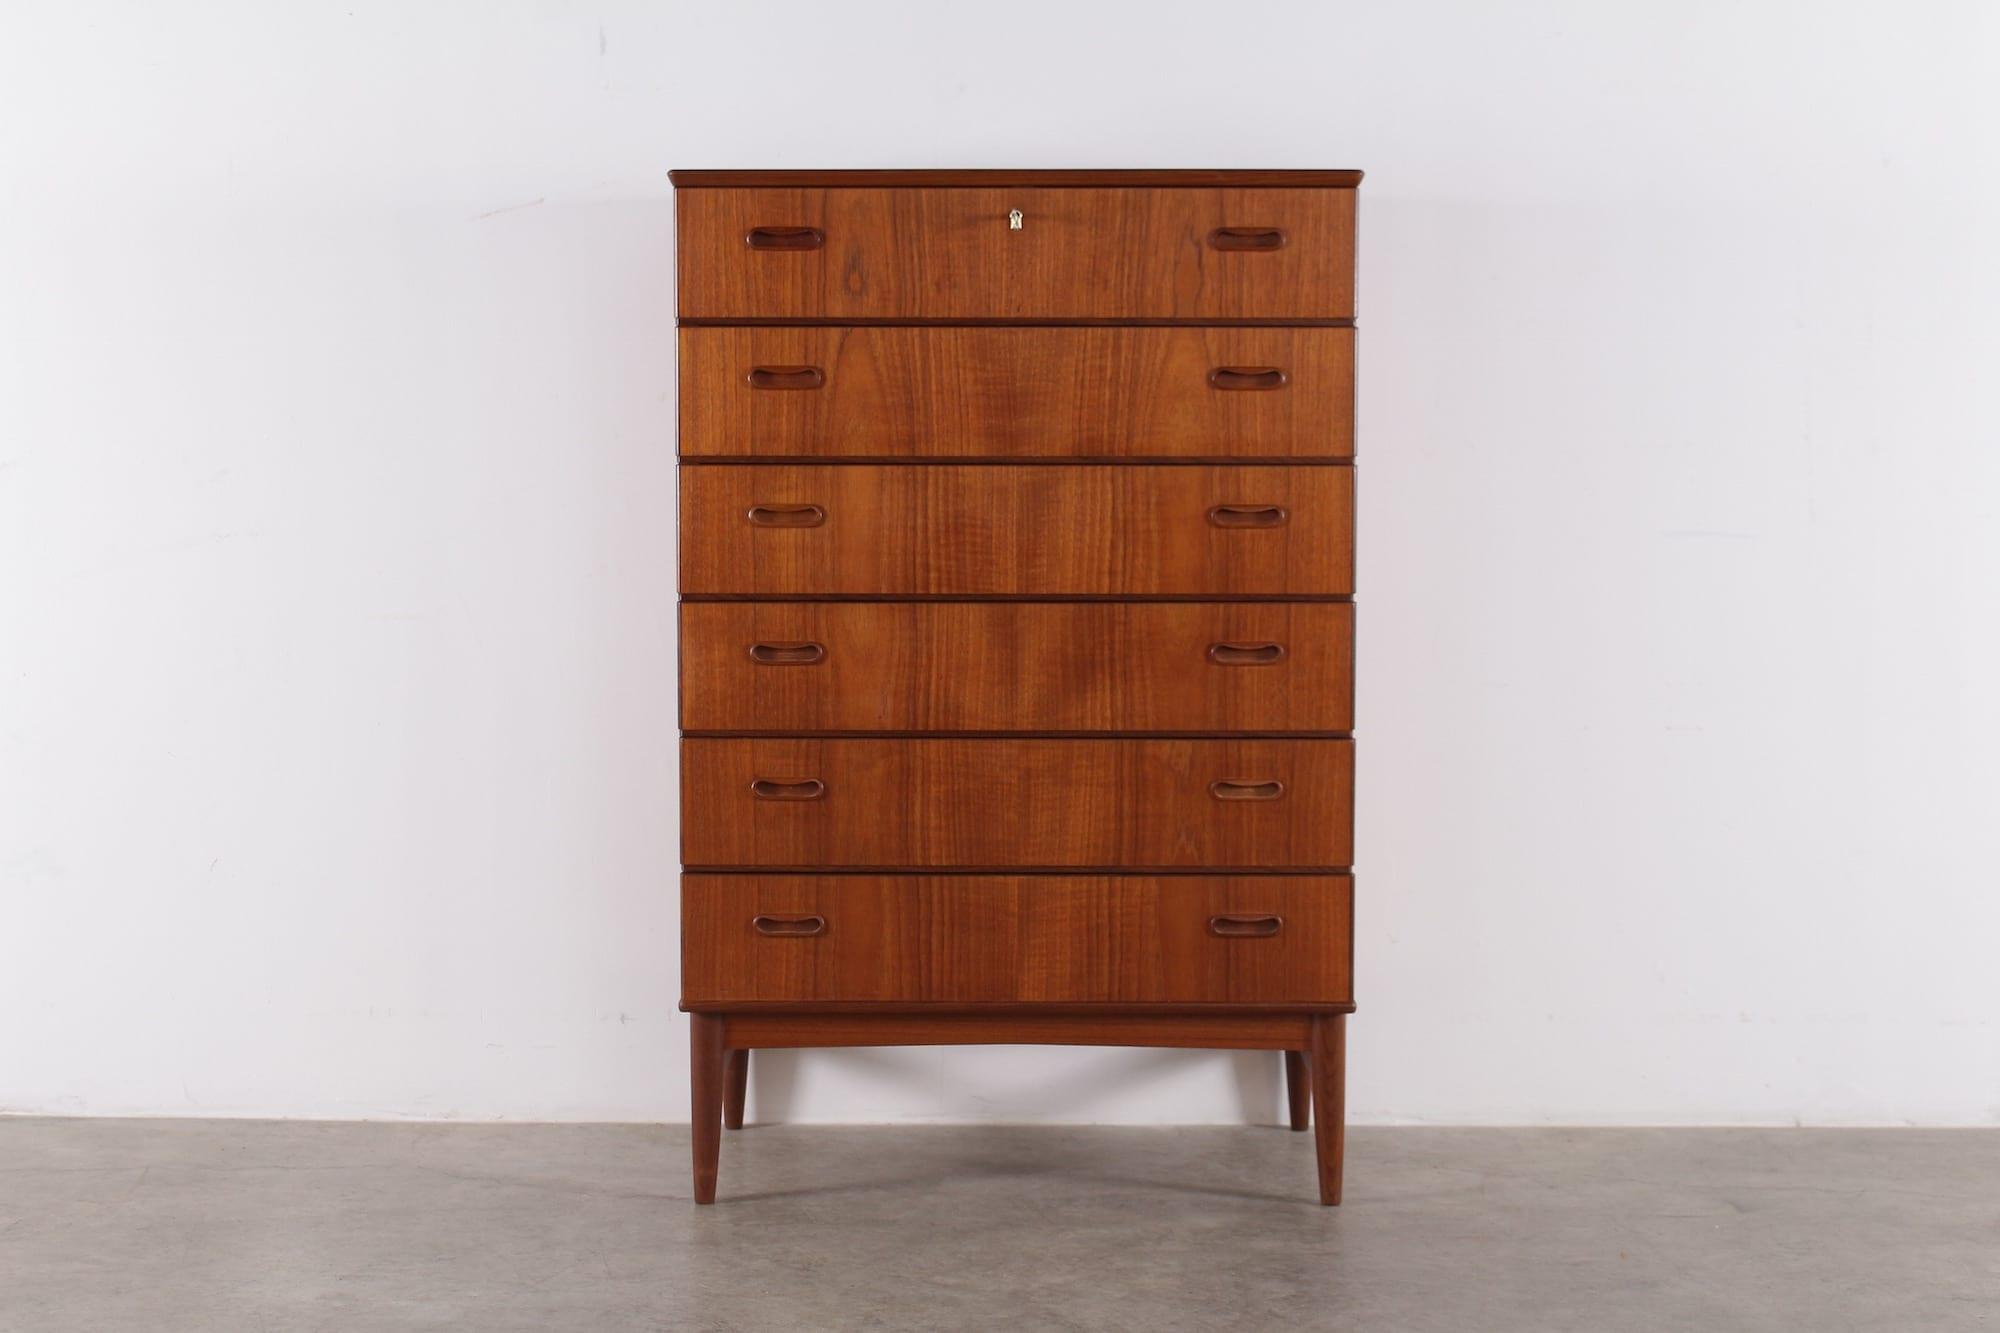 commode danoise 6 tiroirs meubles vintage li ge. Black Bedroom Furniture Sets. Home Design Ideas